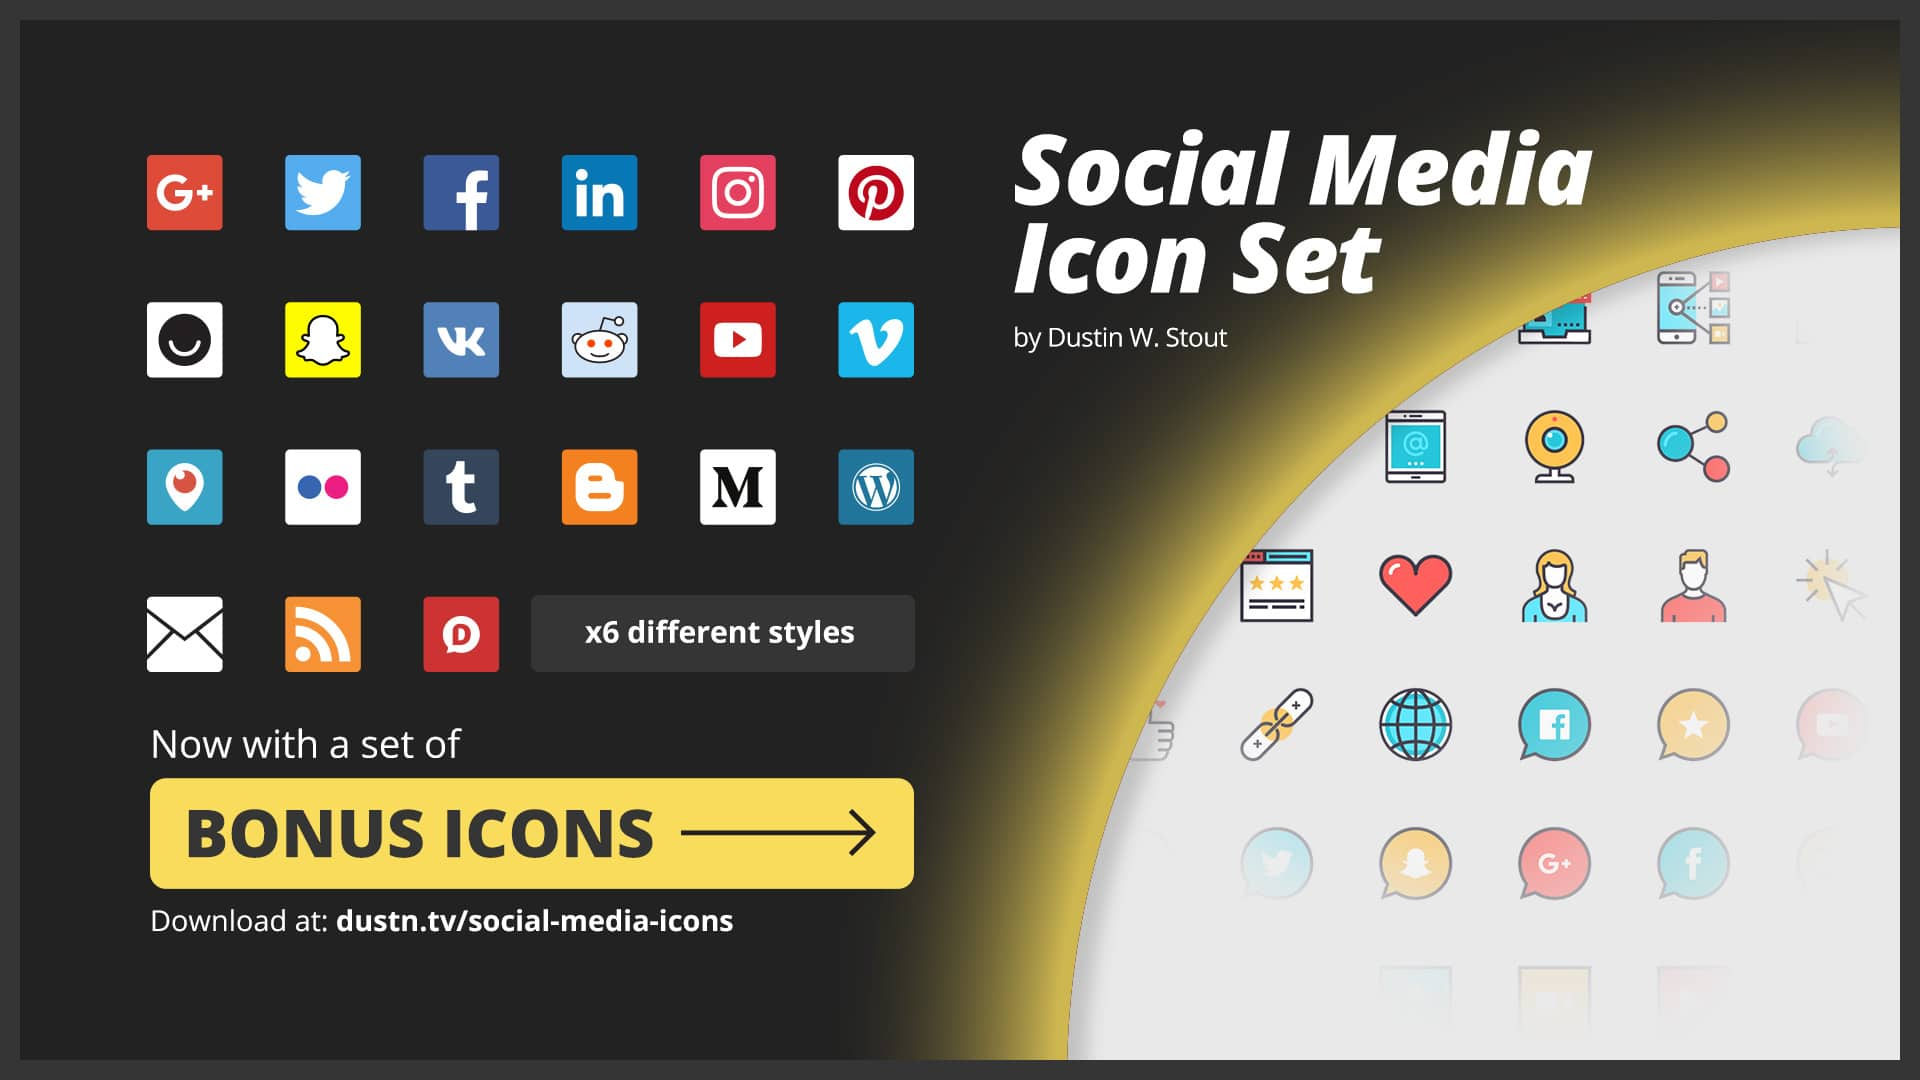 social-media-icons-1920x1080.jpg